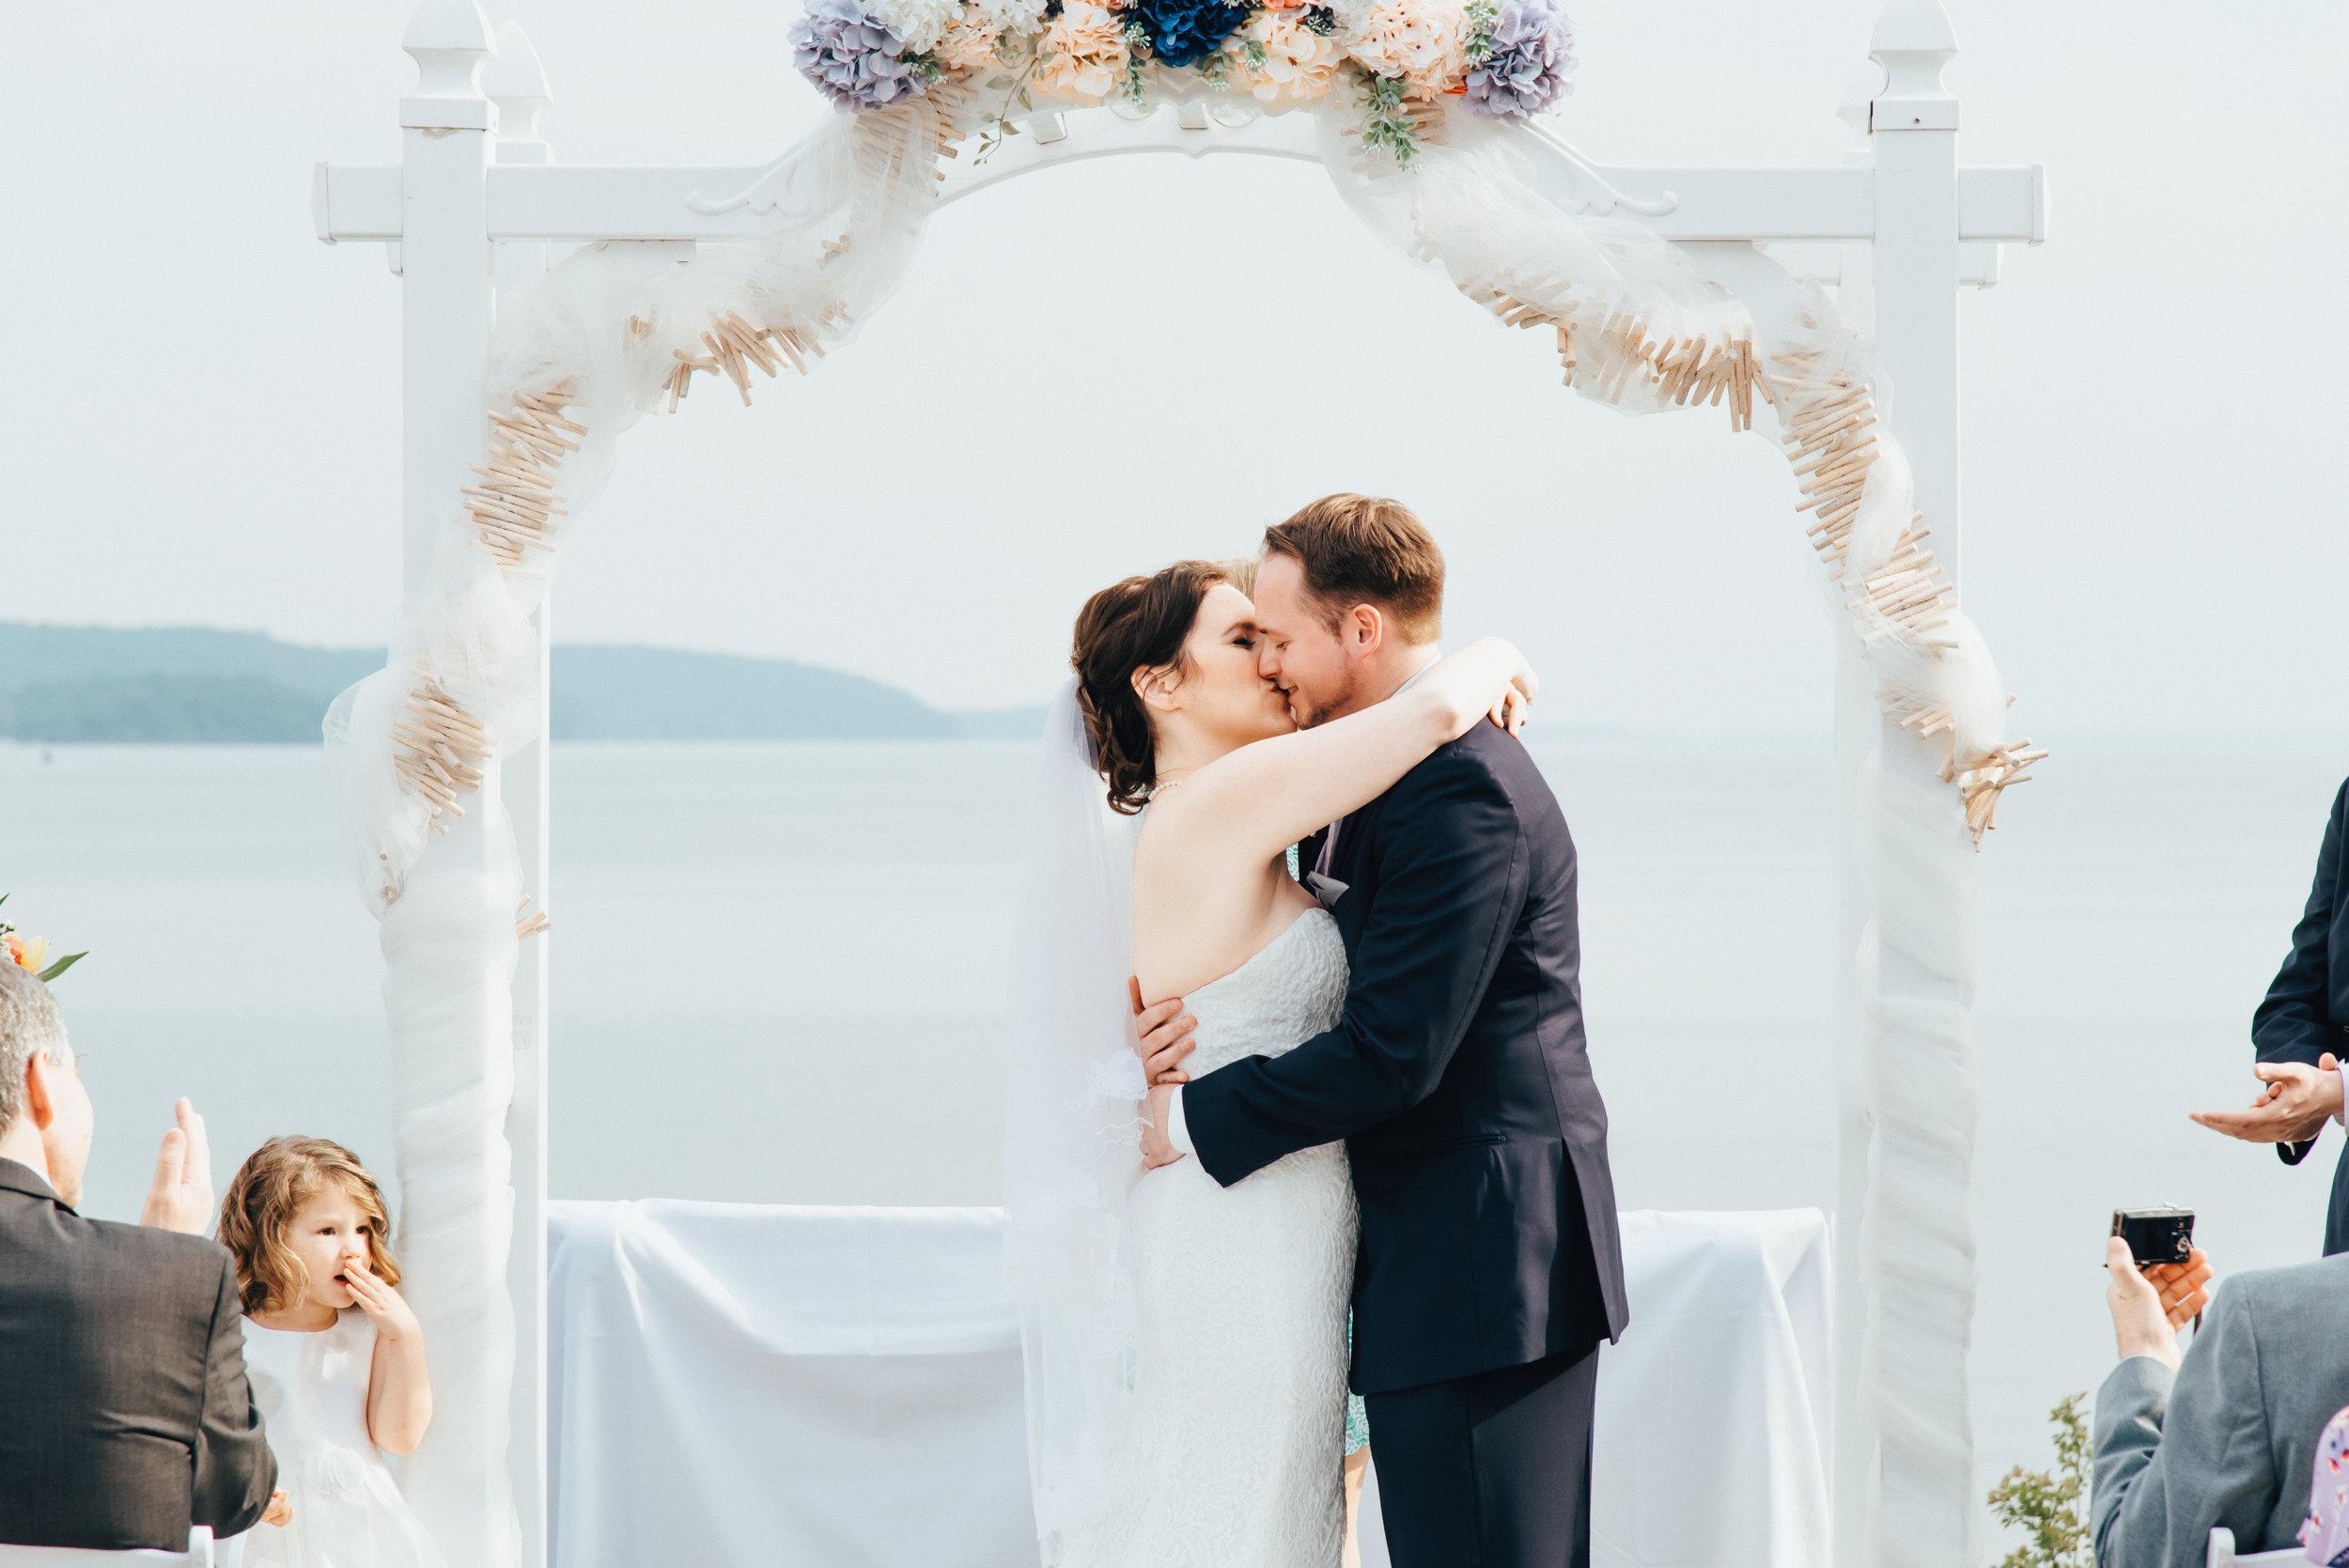 20180828_weddingwebsite_small_65.jpg